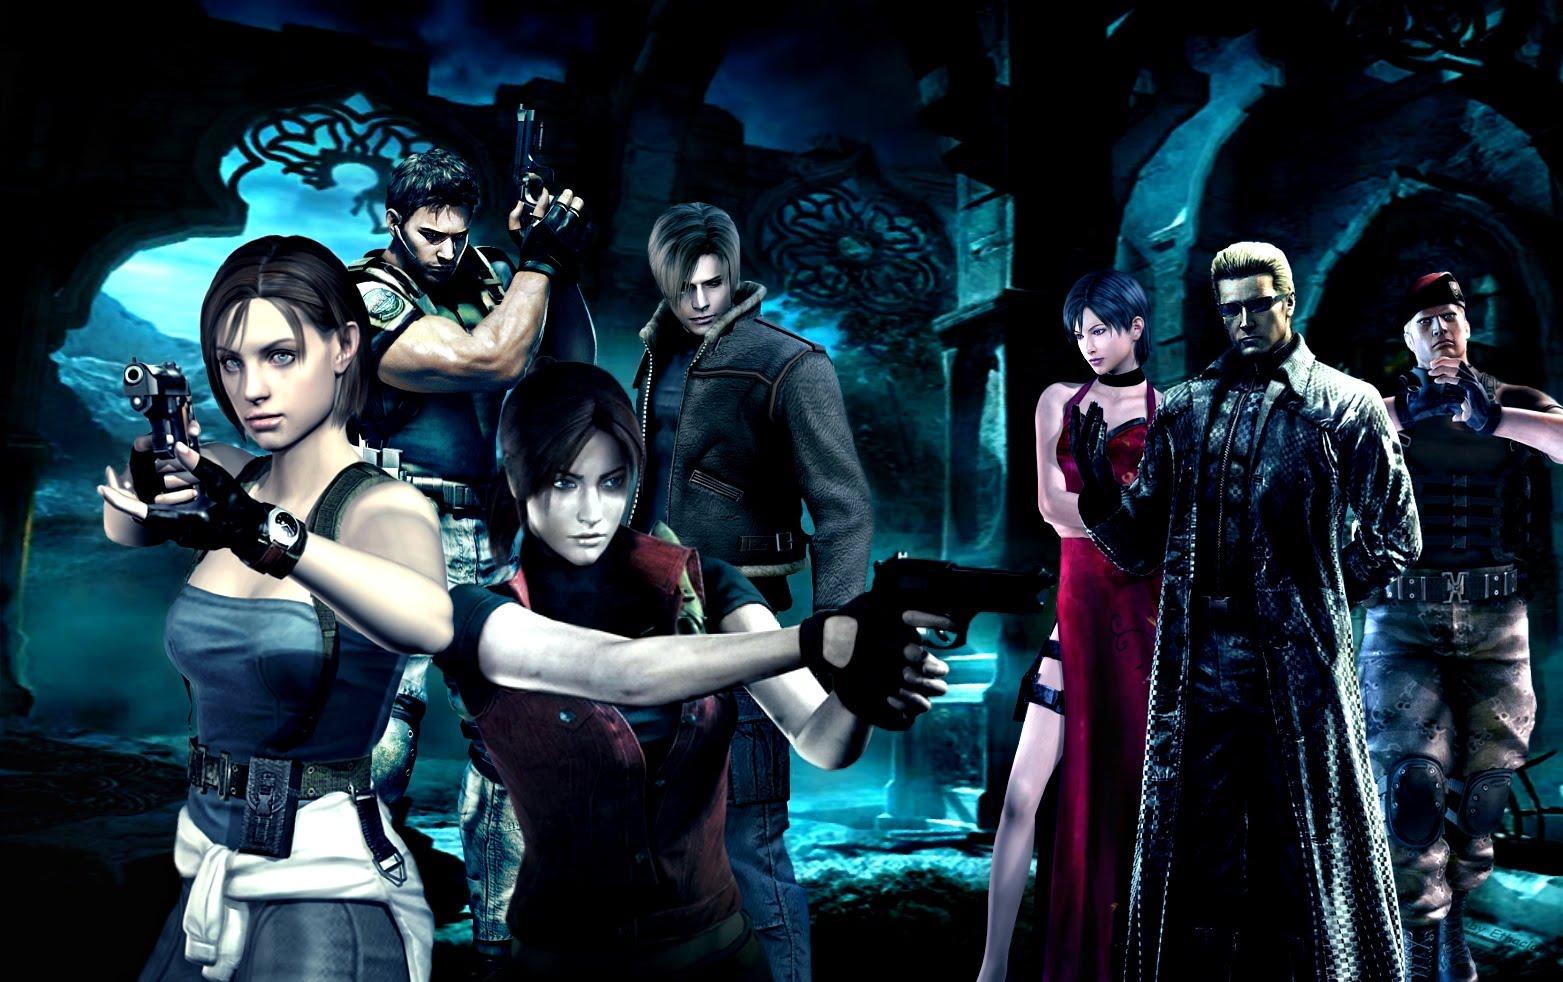 Free Download Wallpaper Resident Evil Videojuegos Unos Que